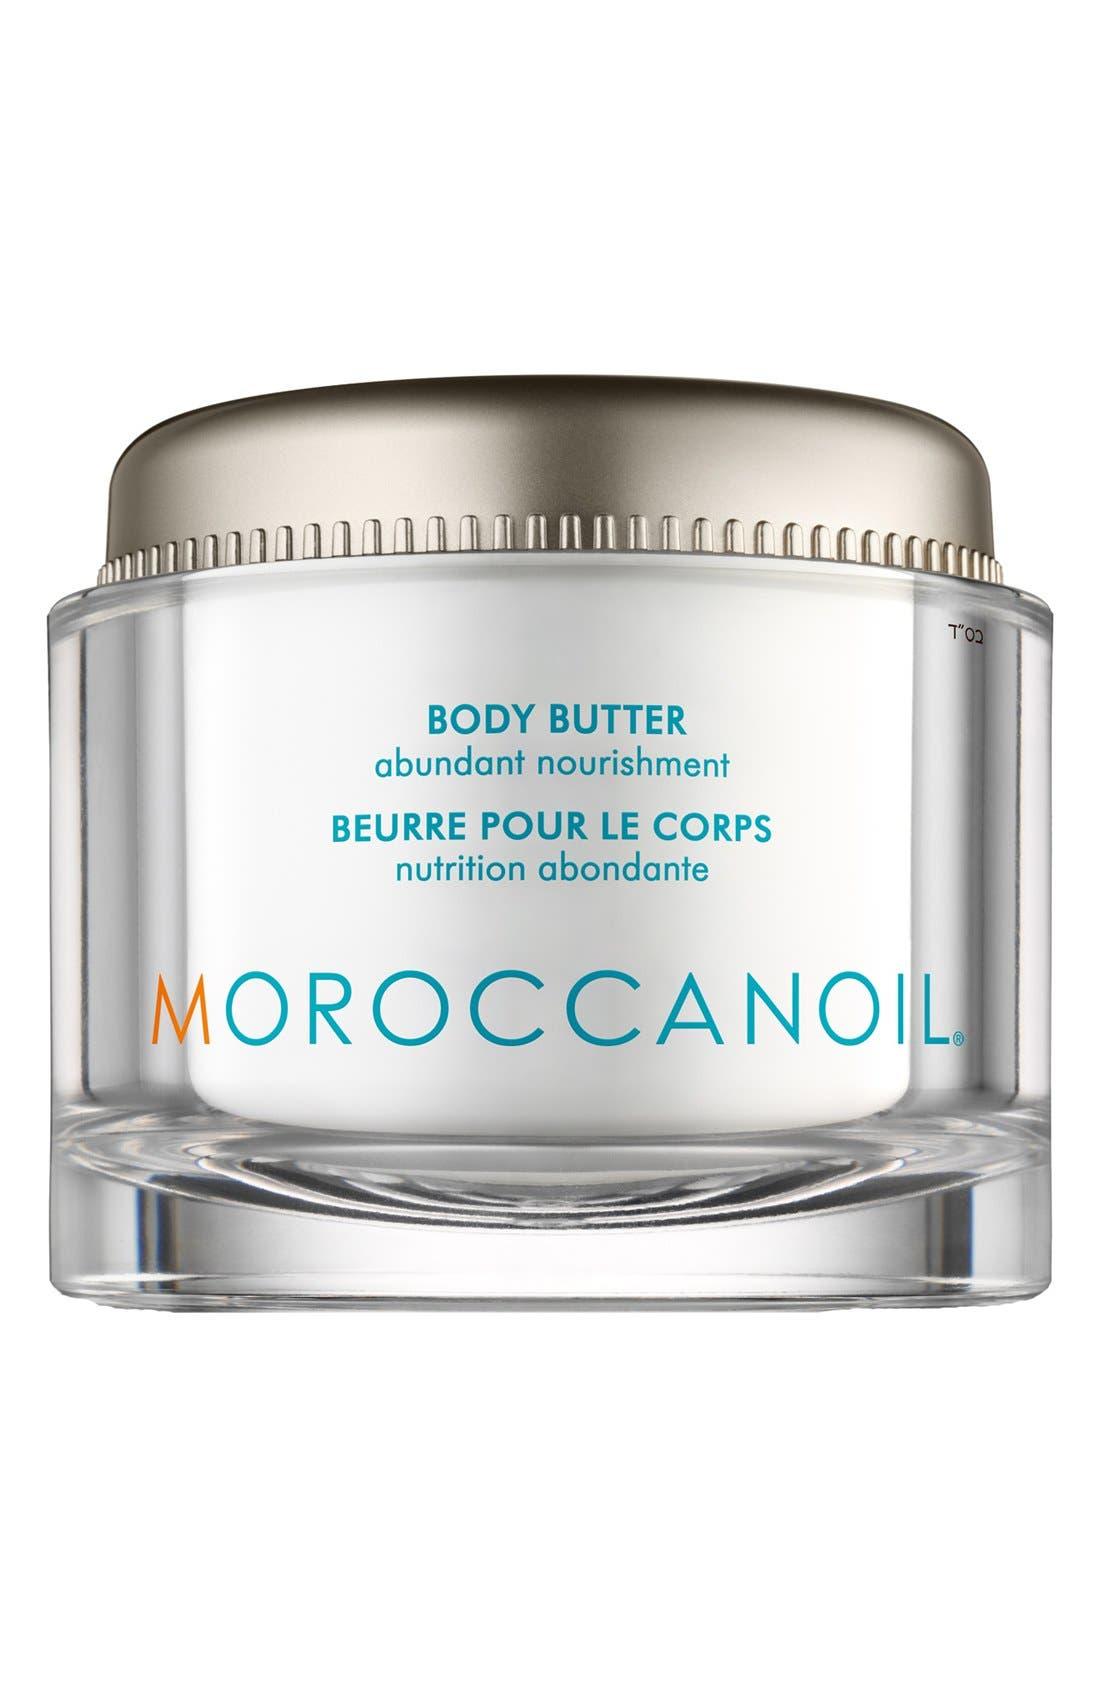 MOROCCANOIL® Body Butter